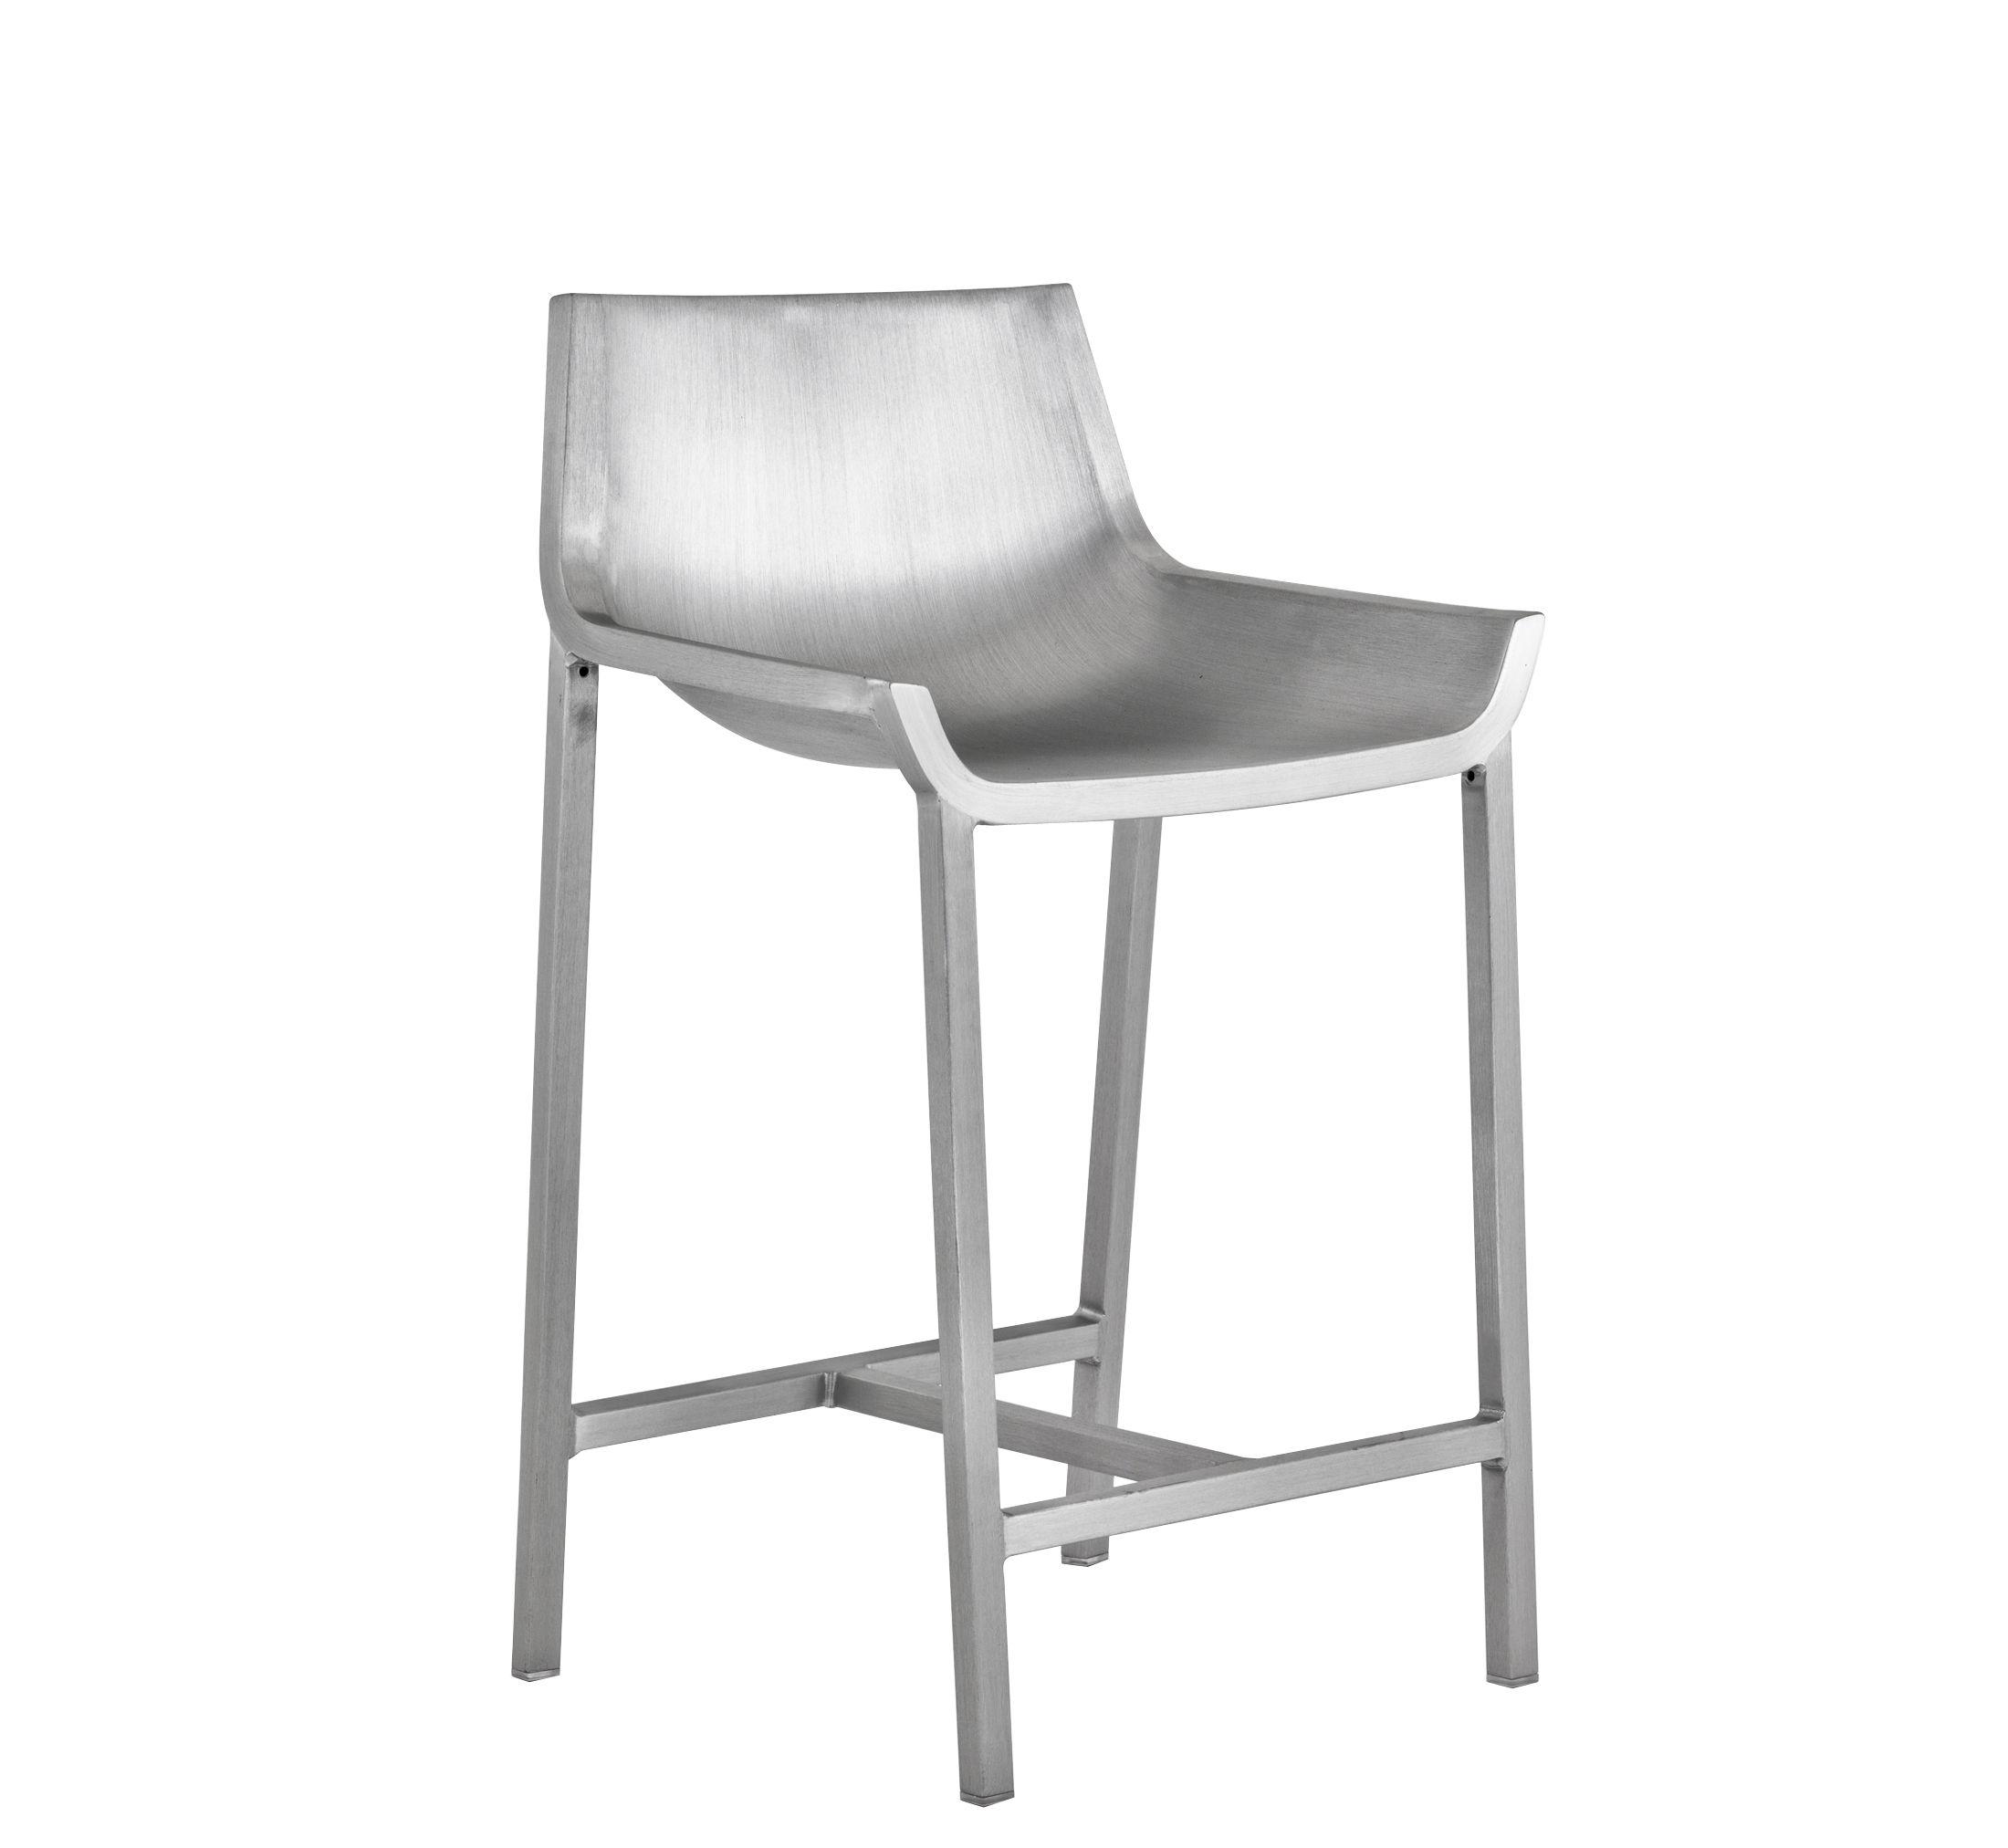 Mobilier - Tabourets de bar - Chaise de bar Sezz / H 61 cm - Aluminium - Emeco - Aluminium brossé - Aluminium recyclé finition brossé